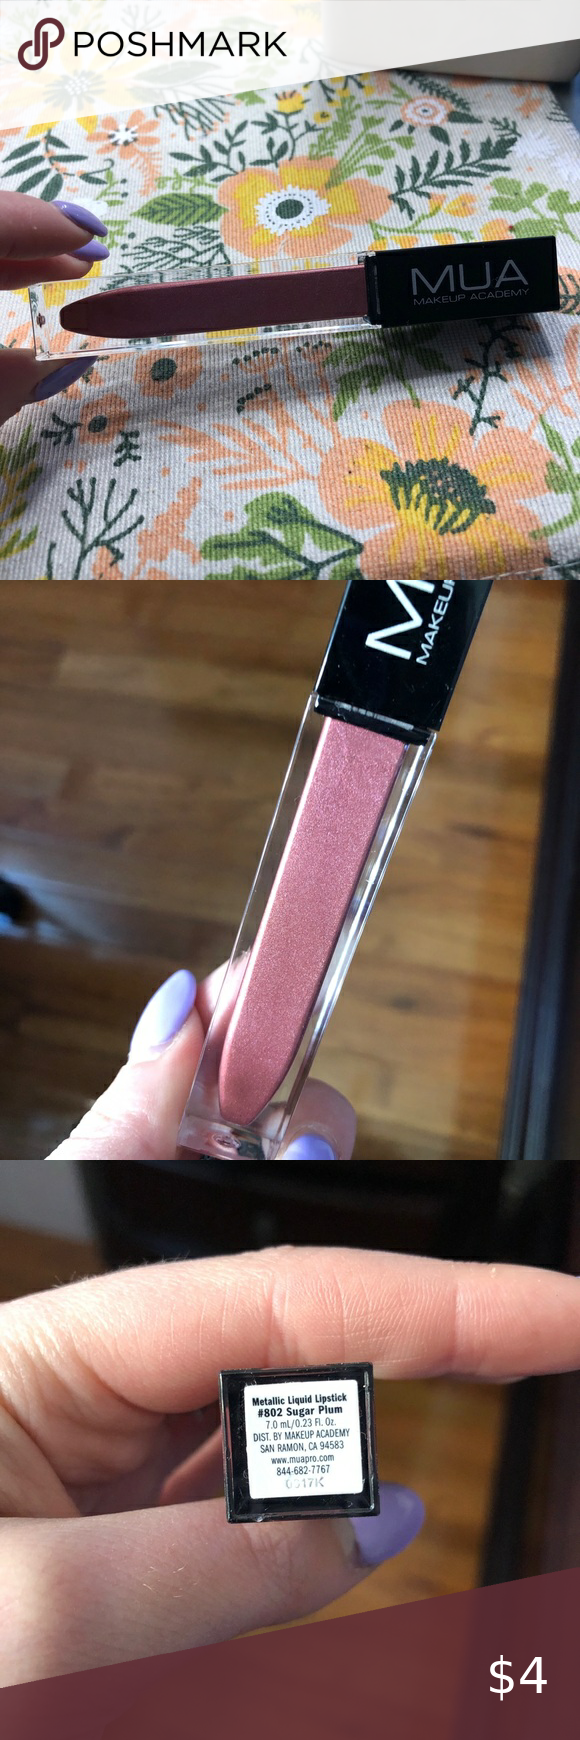 MUA Makeup Academy liquid lipstick MUA makeup academy